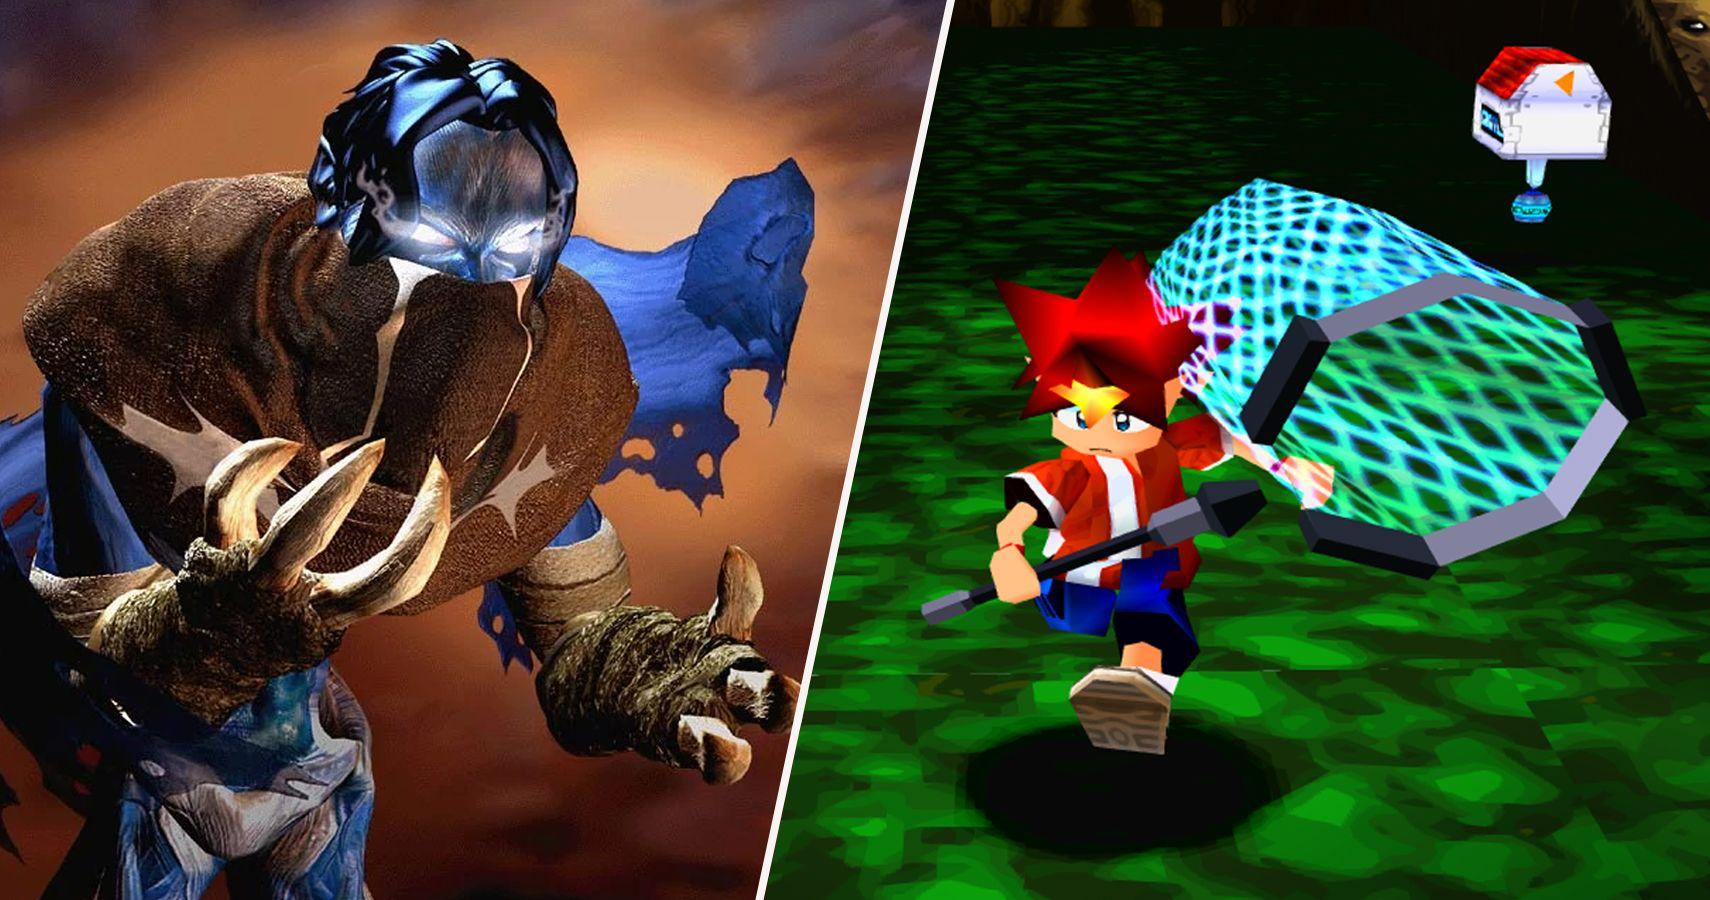 20 Notoriously Bad PlayStation 1 Games That Everyone Played